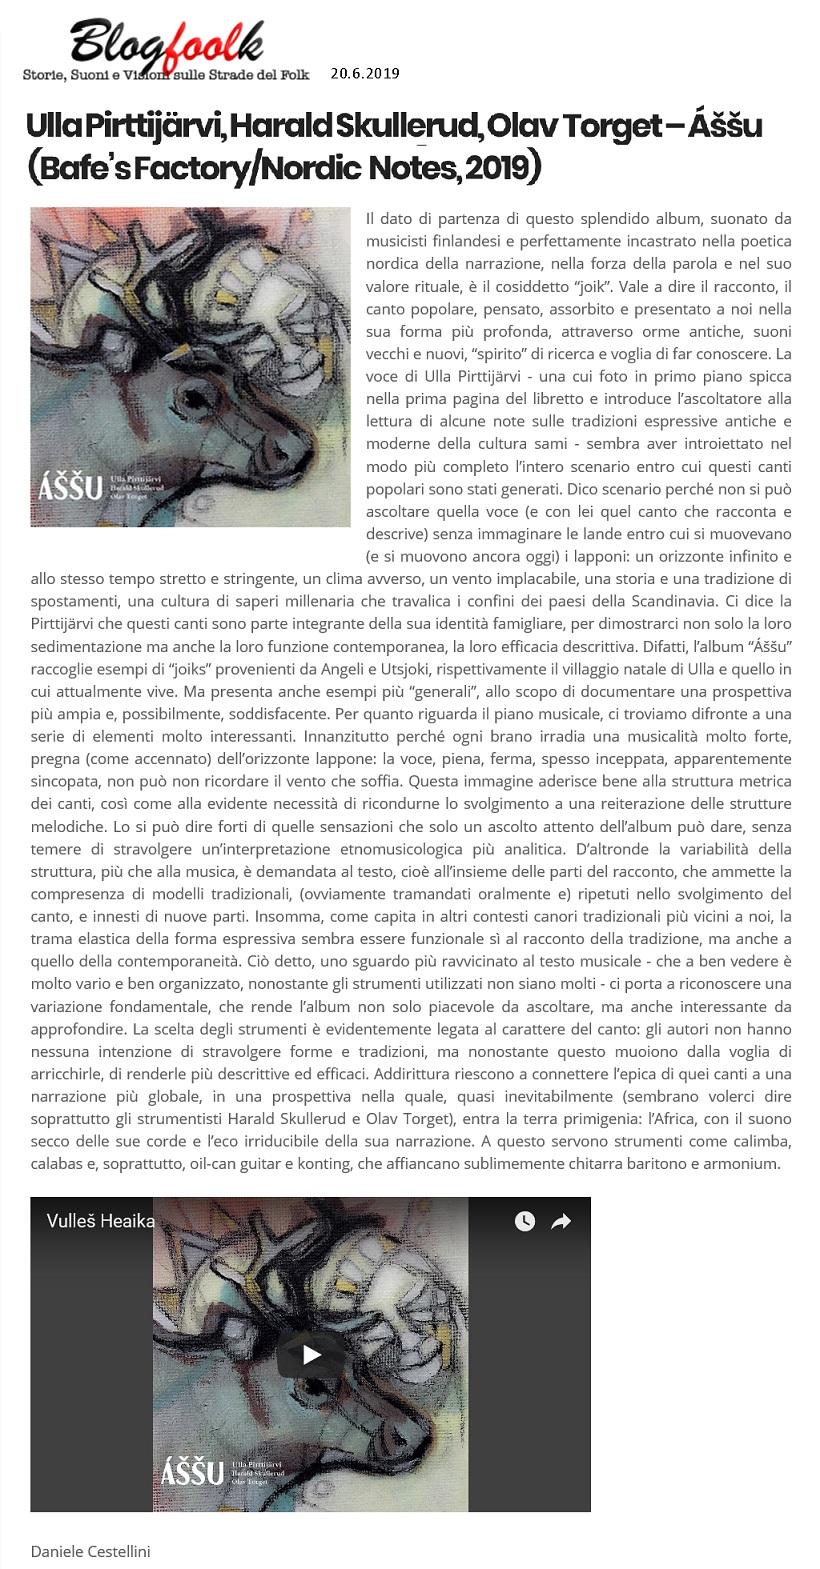 Blogfoolk (Italy), 20.6.2019